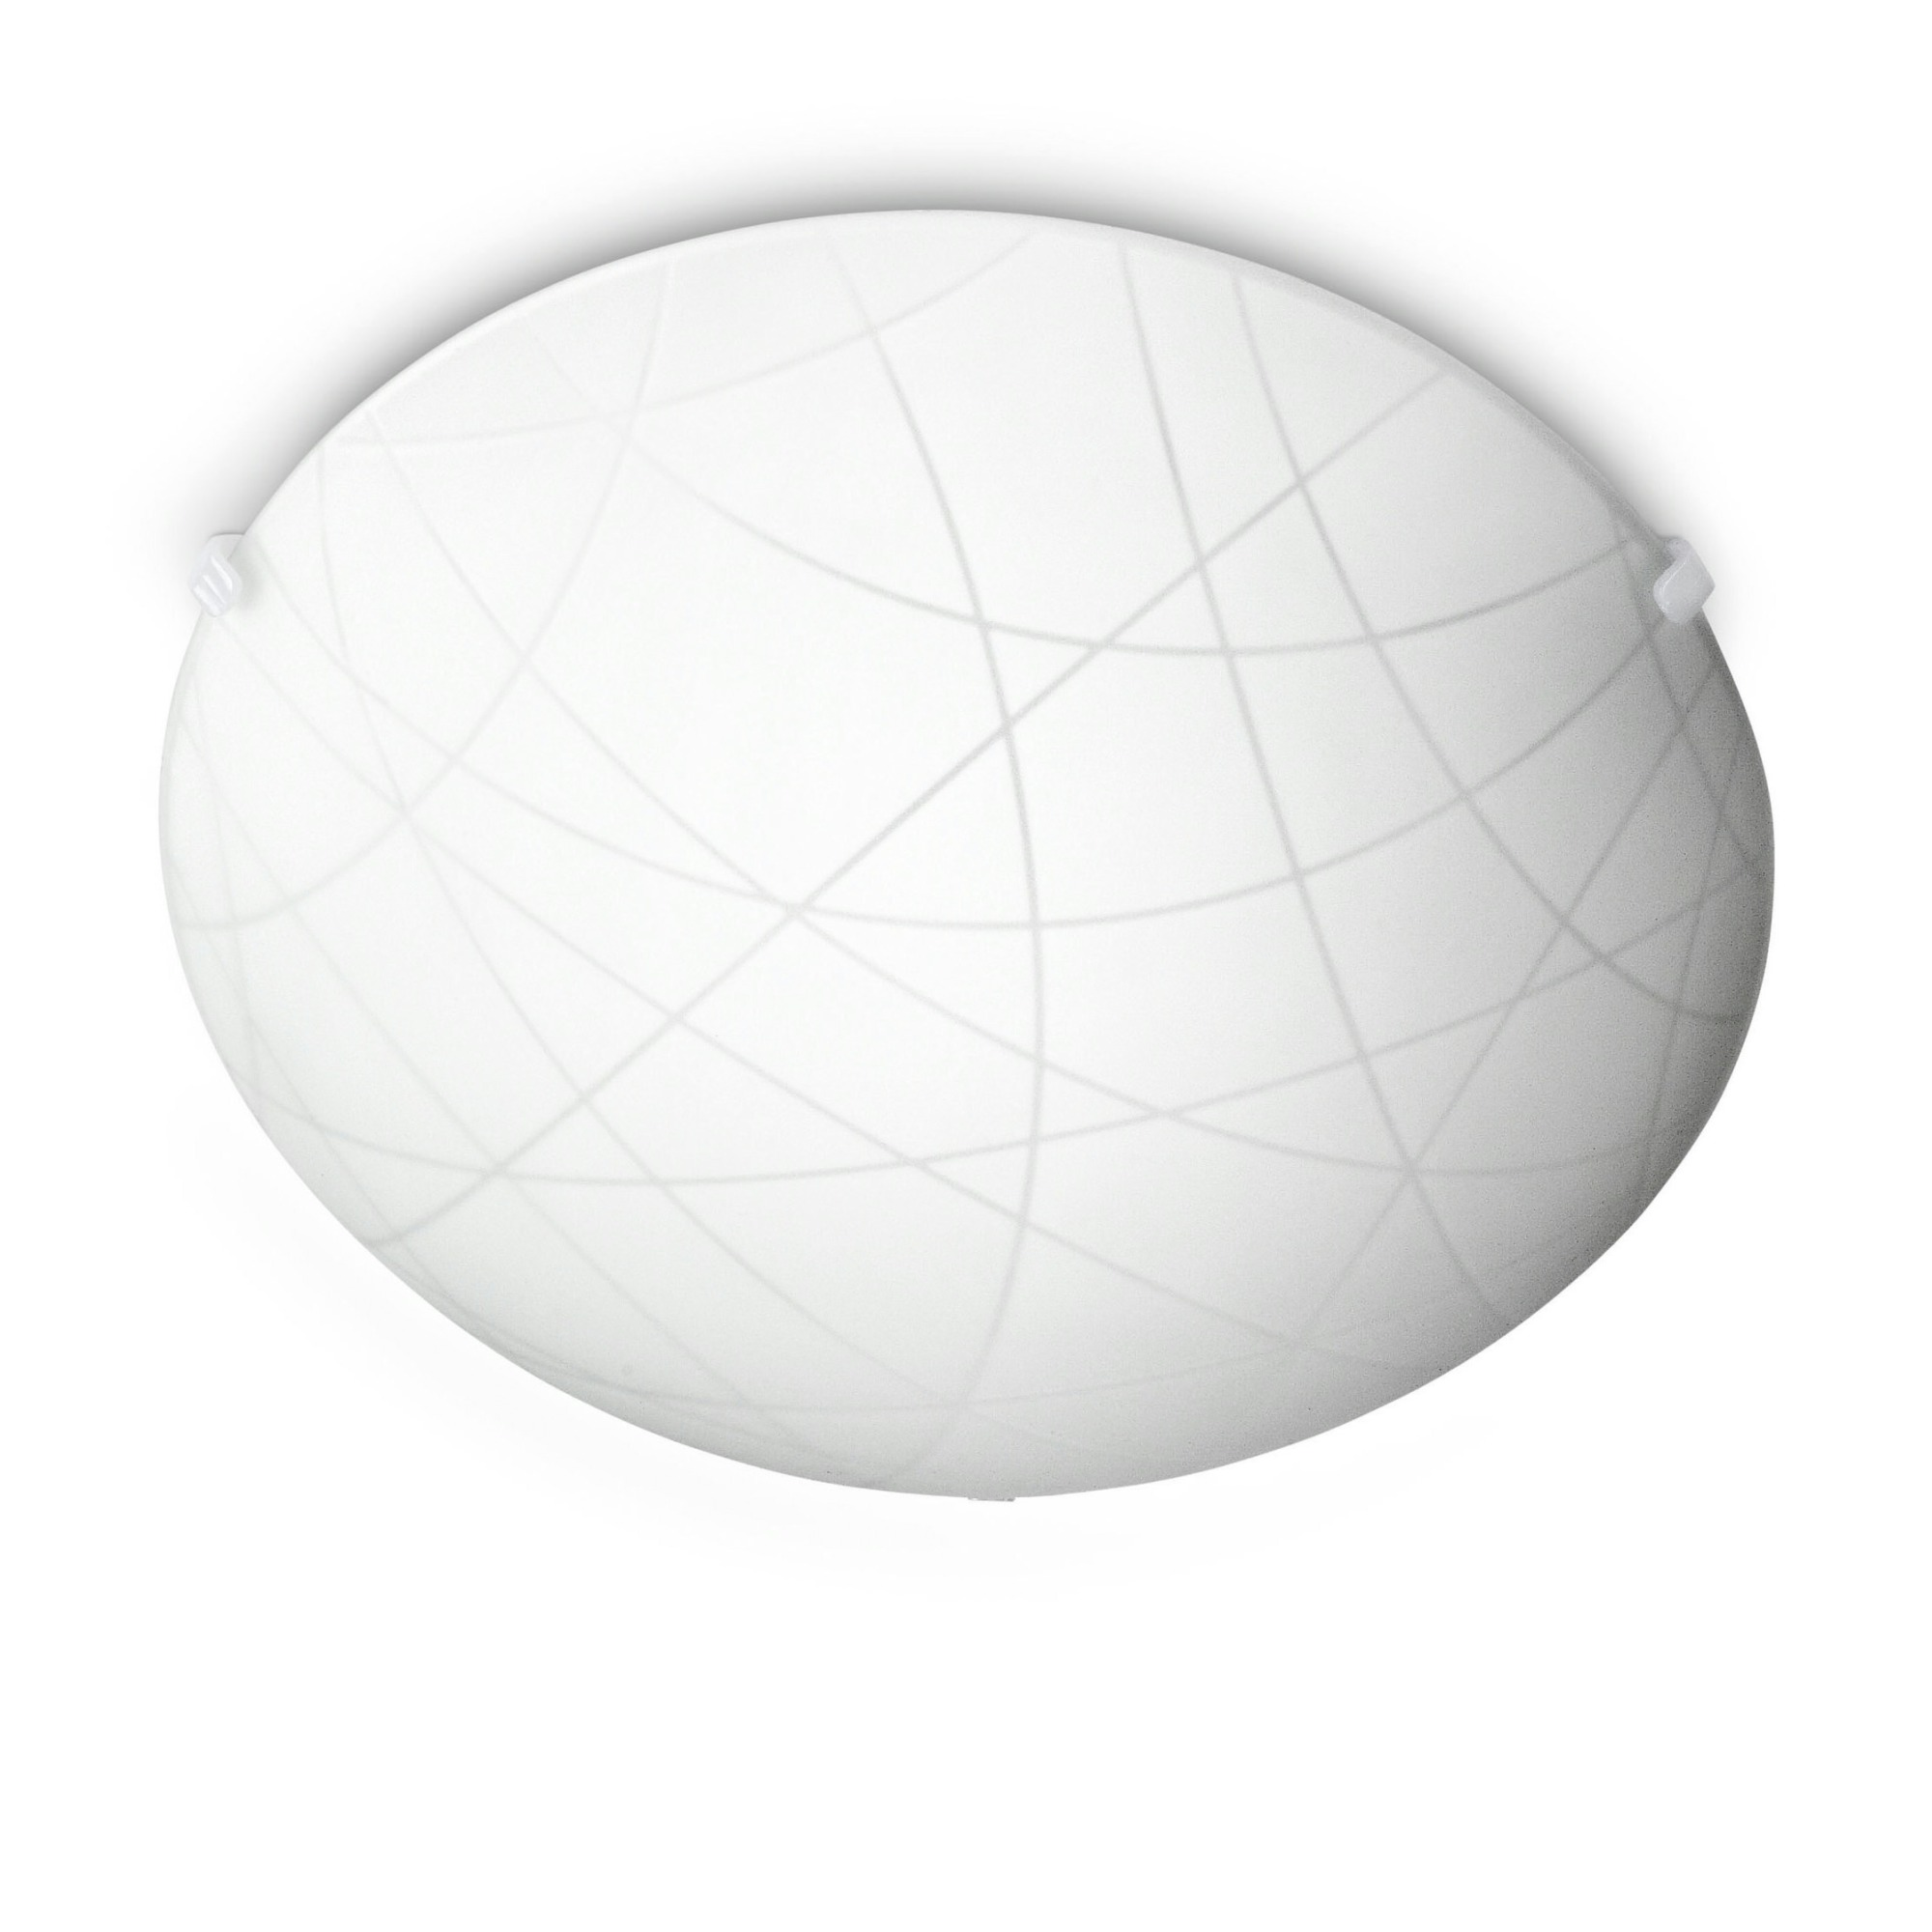 Philips myliving chantilly plafondlamp 230 v 60 w e27 wit